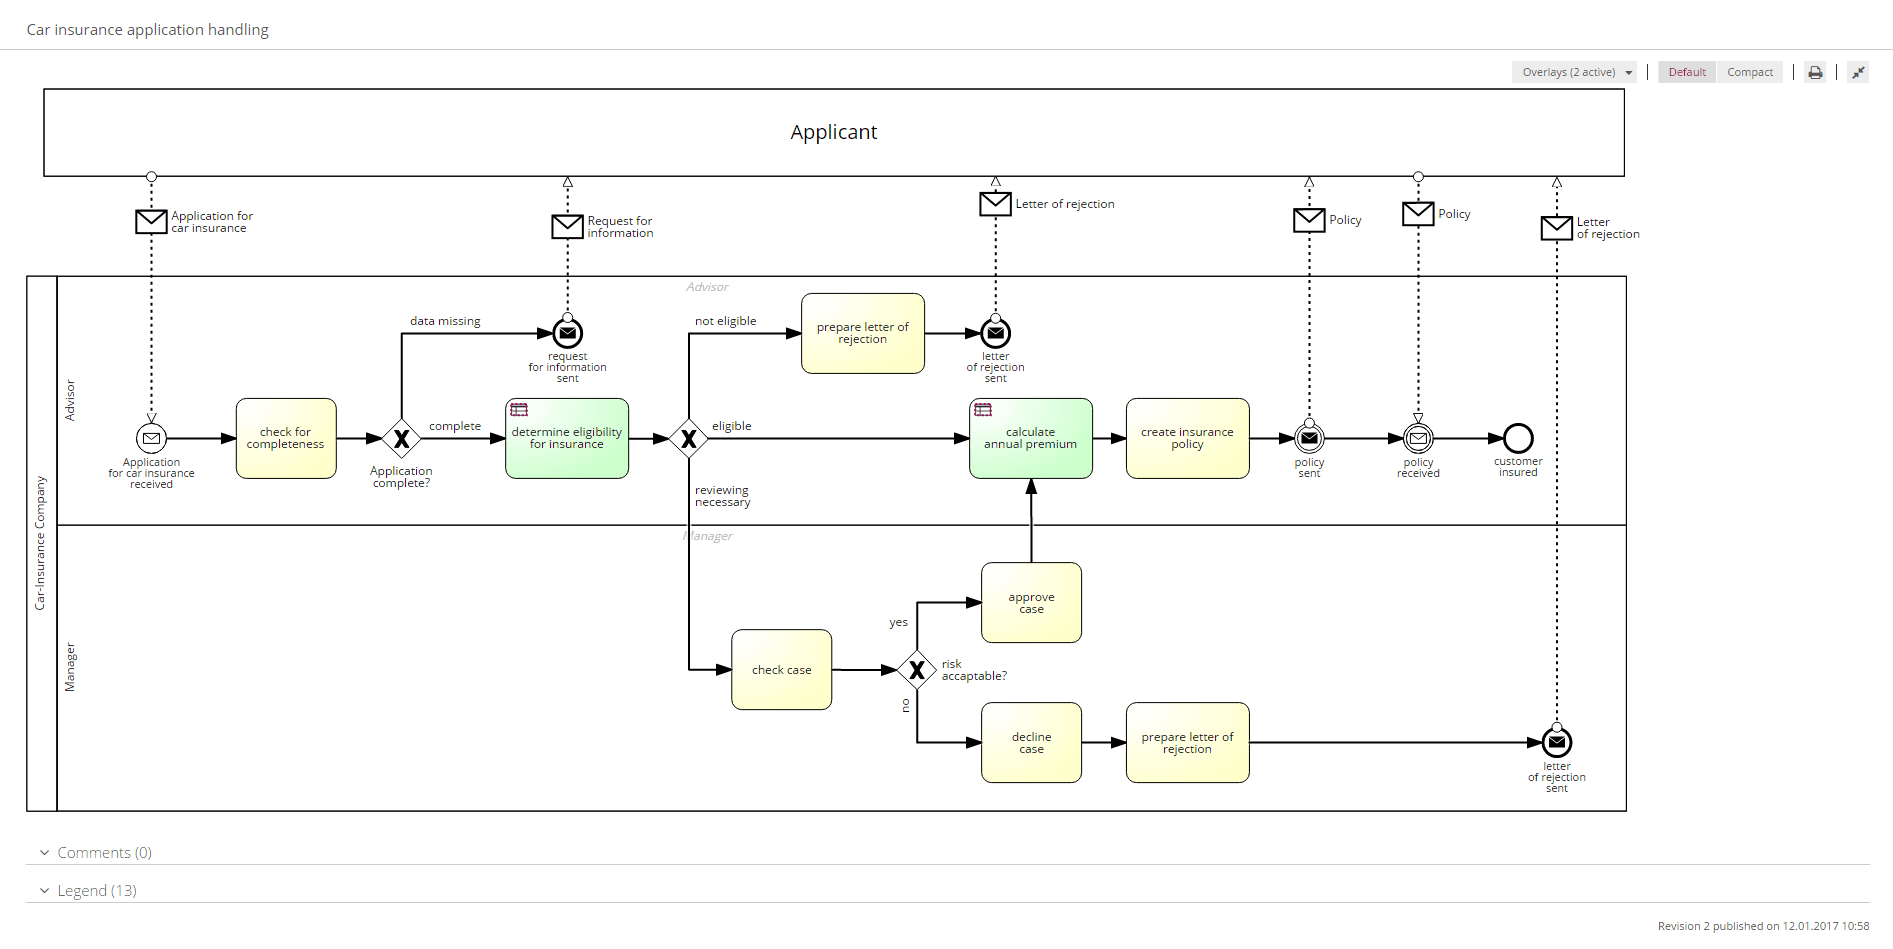 signavio s a z defines process management b like bpmn